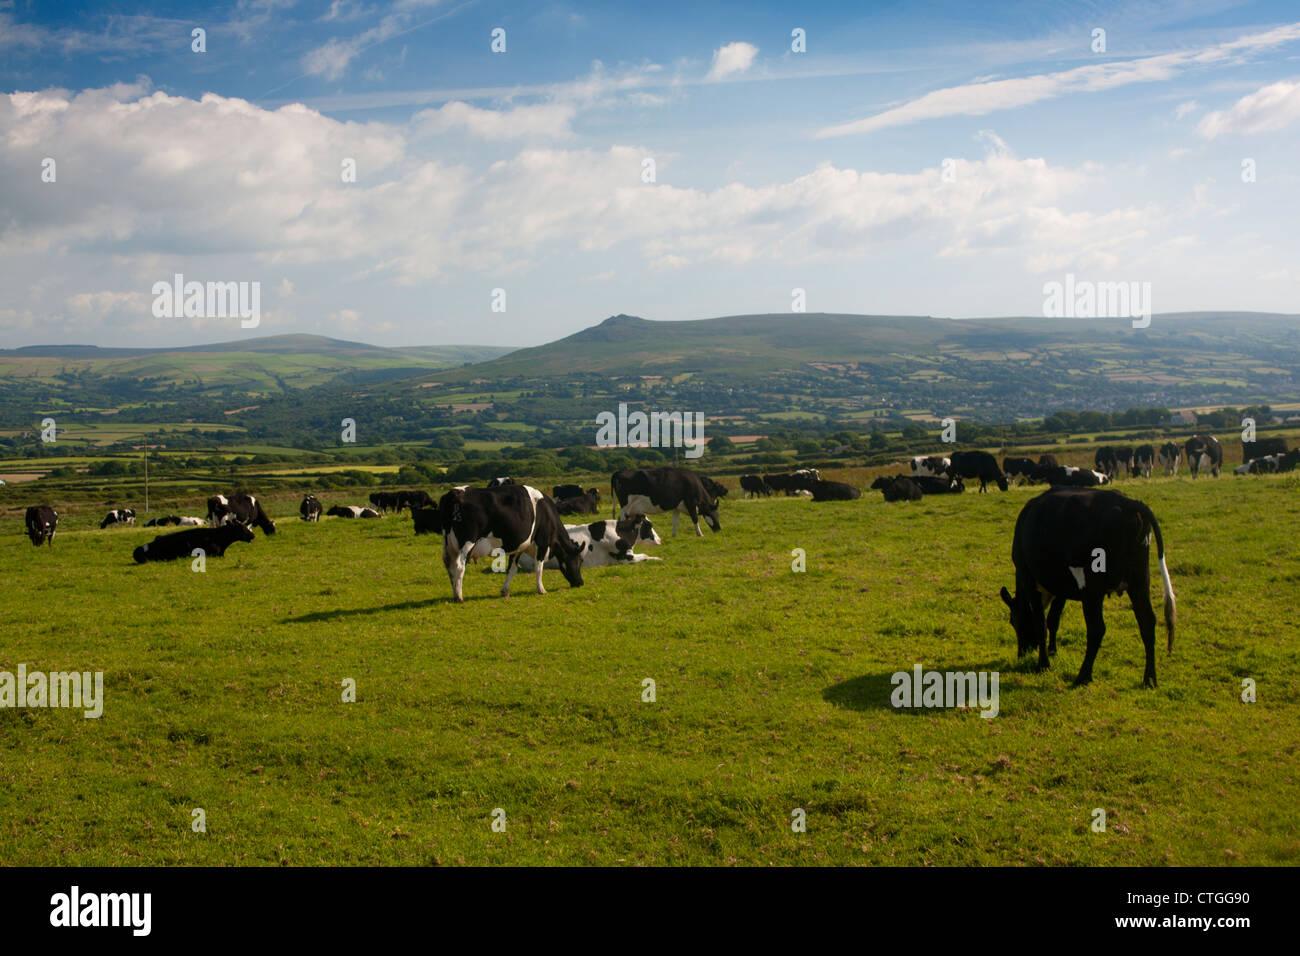 Dairy Farm Cattle In Field With Preseli Hills North Pembrokeshire Background Near Newport Trefdraeth West Wales UK